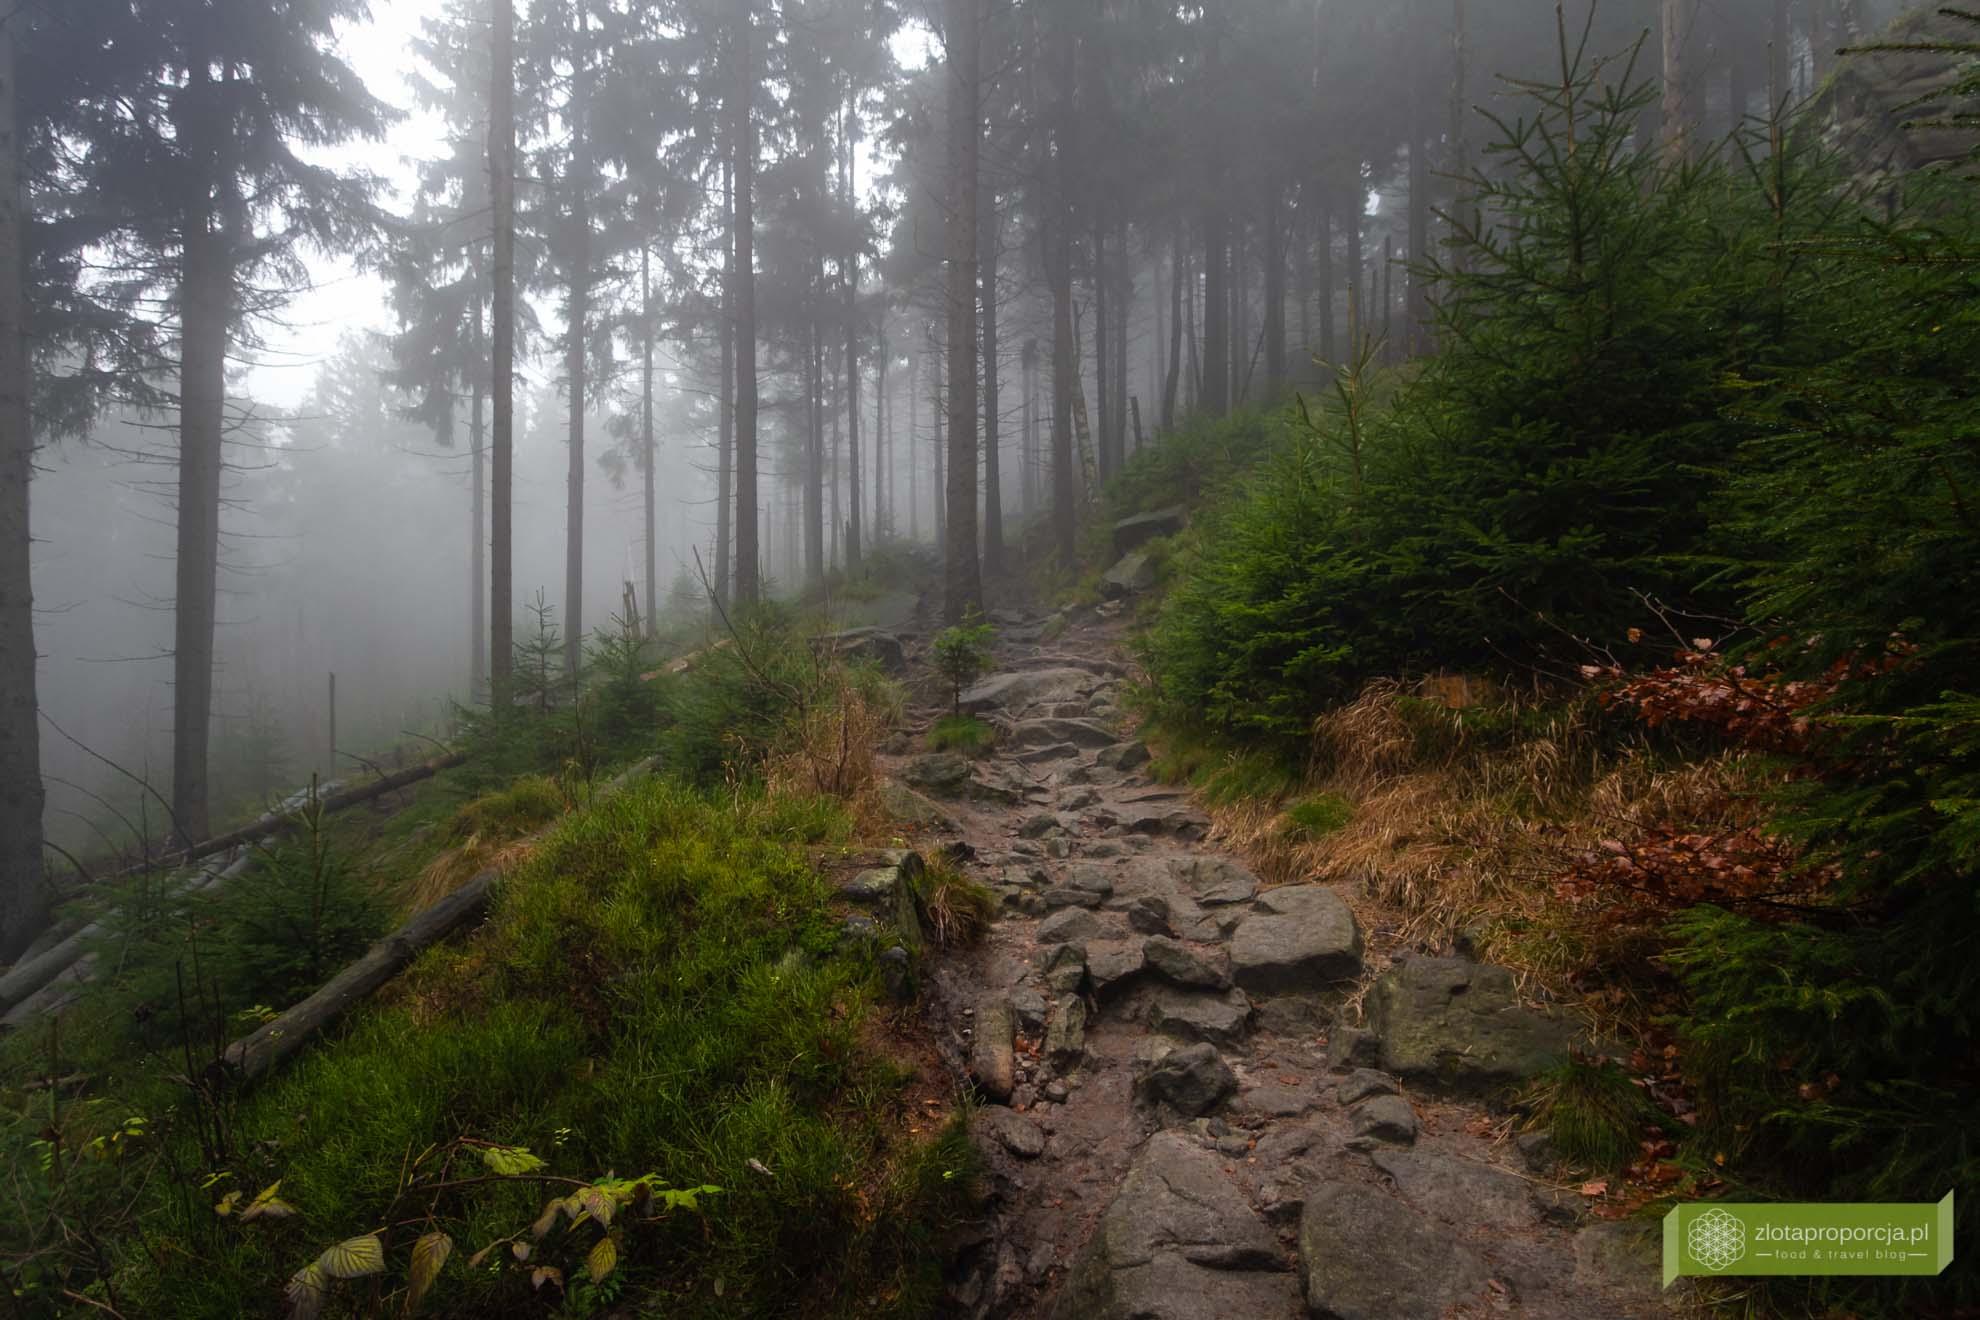 Góry Stołowe Dolny Śląsk; Góry Stołowe szlaki; Góry Stołowe atrakcje; Błędne Skały